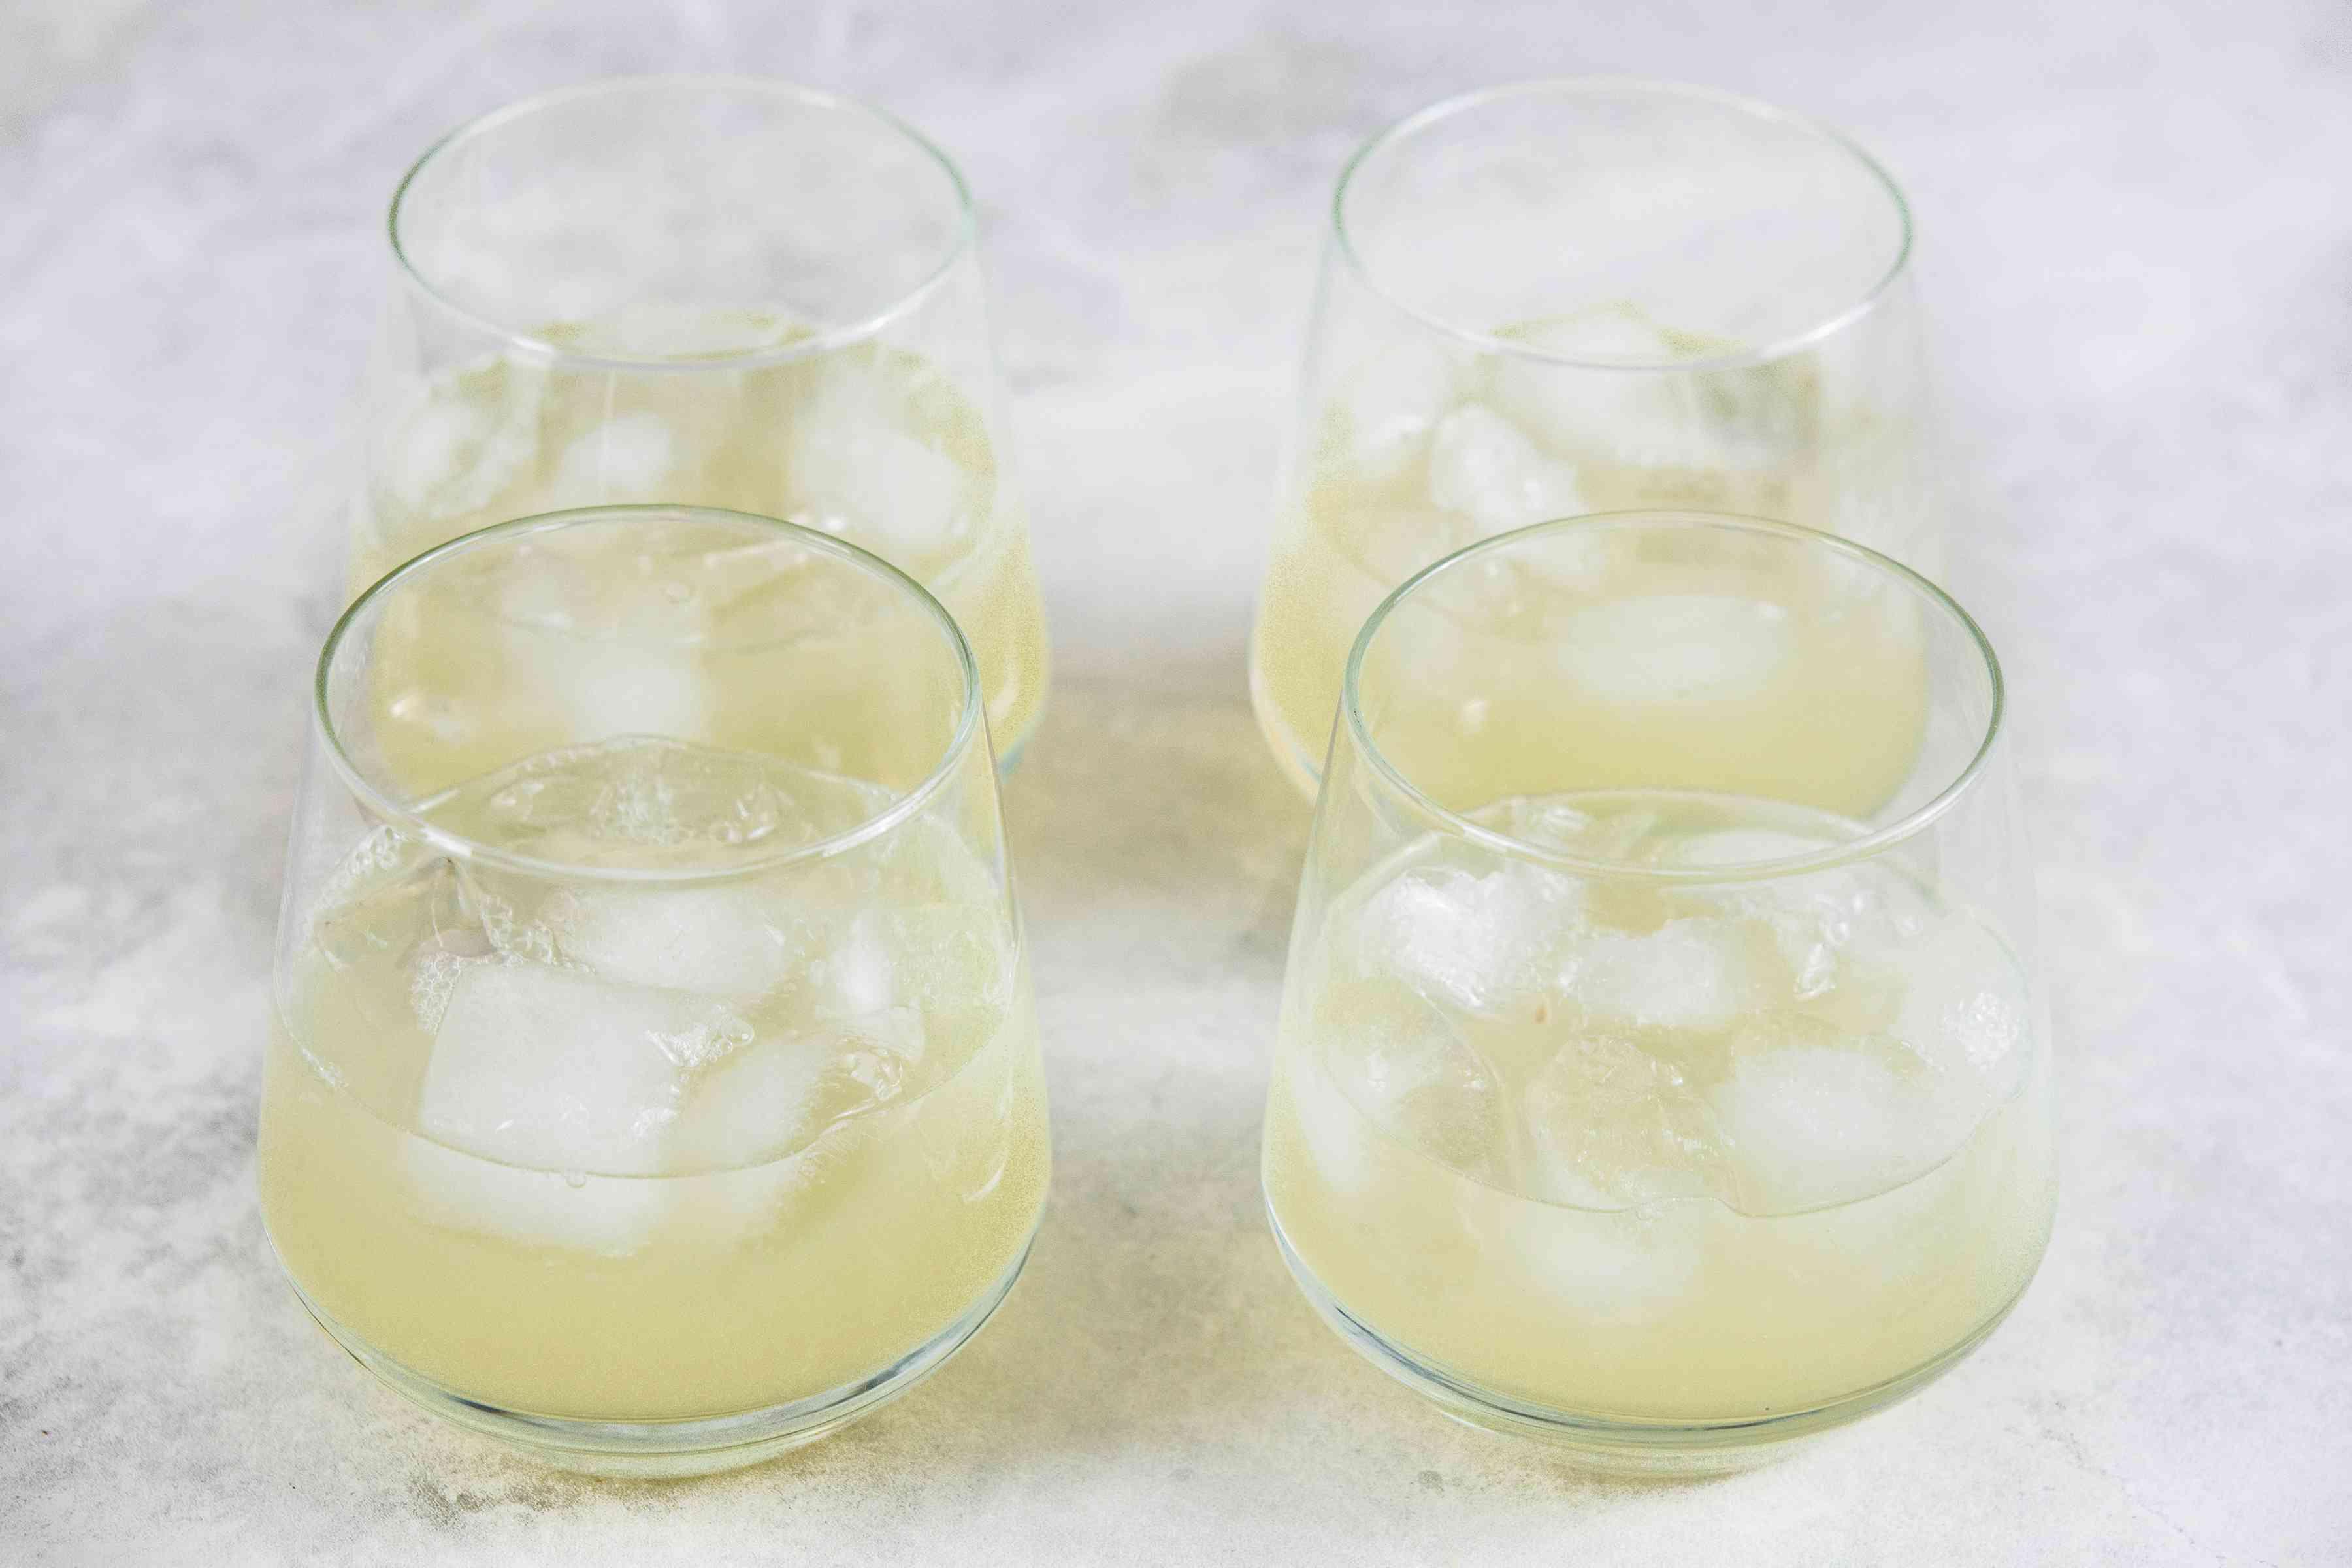 Divide lime juice between glasses